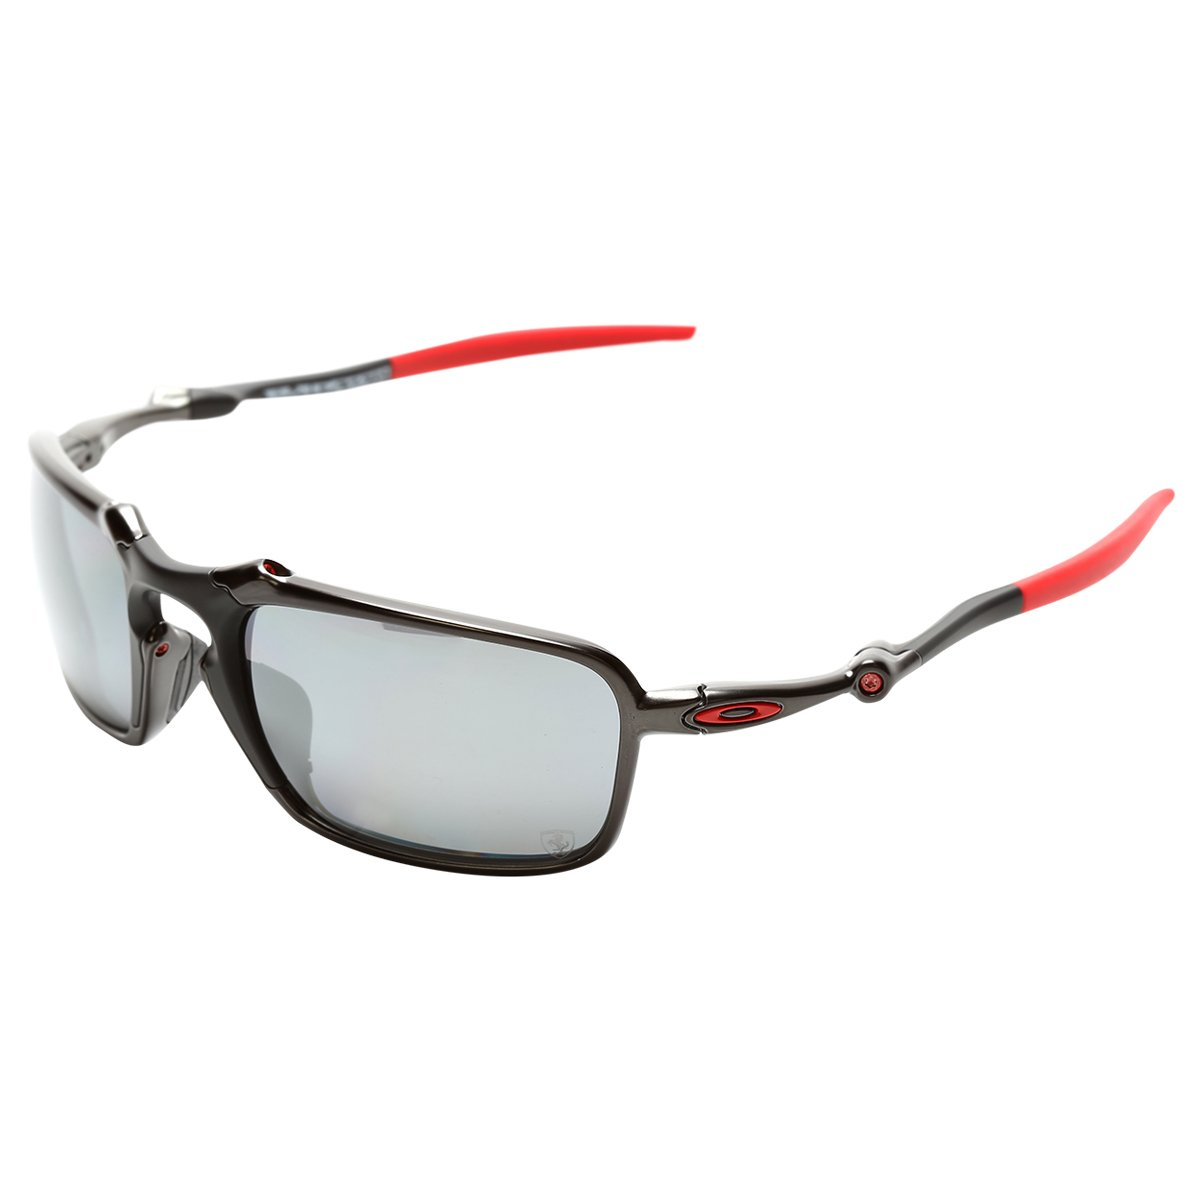 1ce5b346cbcab Óculos Oakley Ferrari Badman Dark Carbon - Iridium Polarizado - Compre  Agora